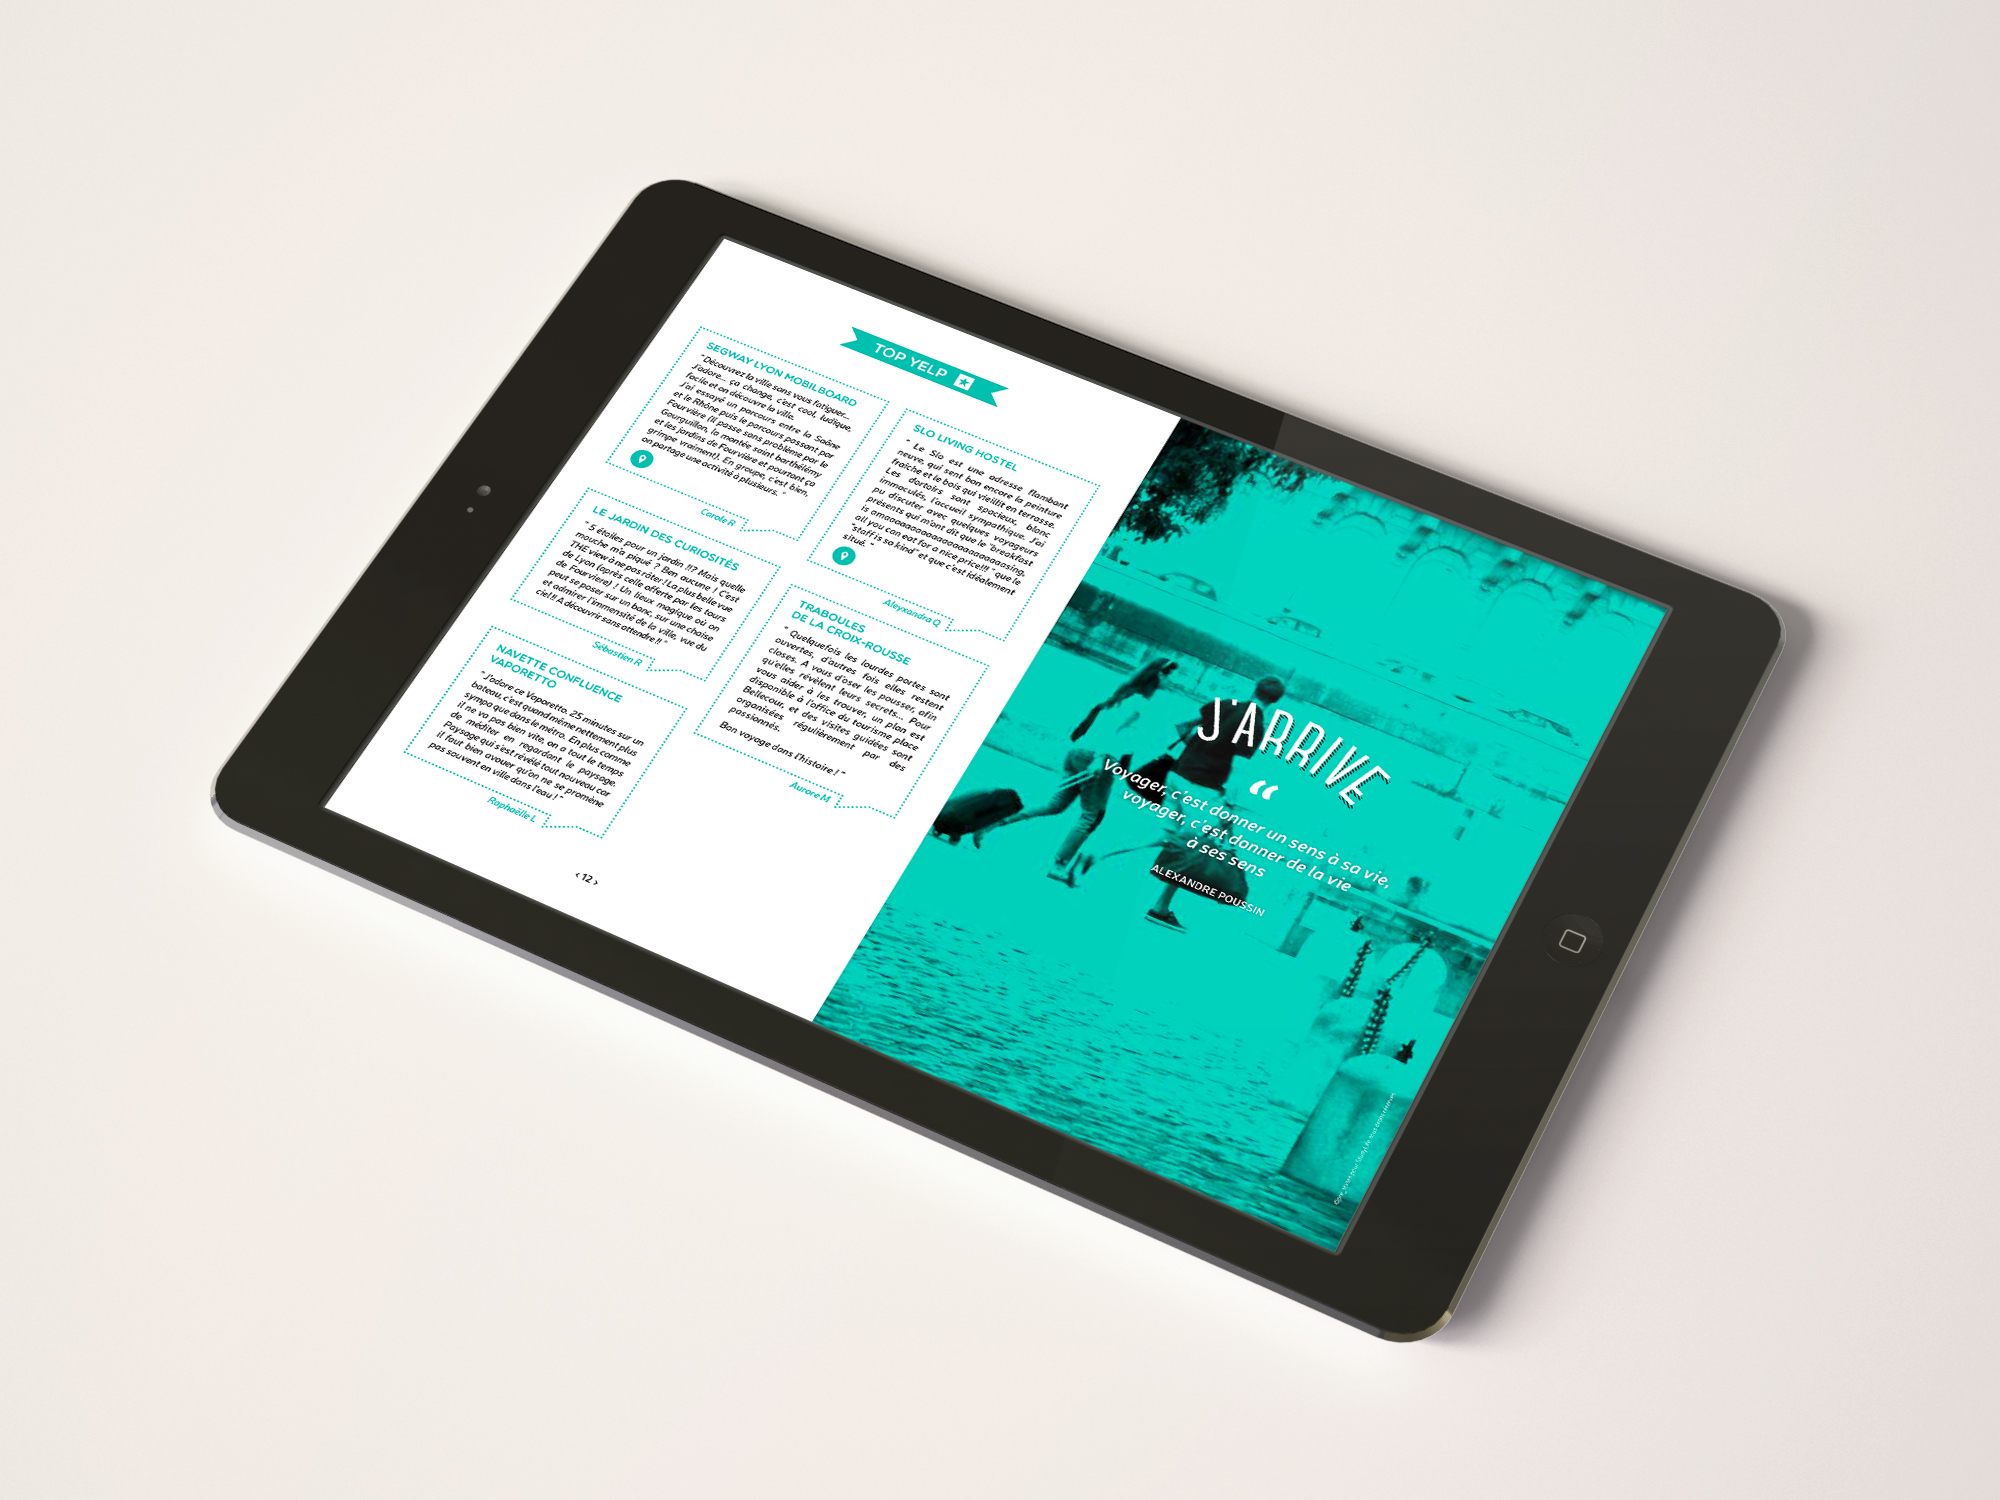 iPadAir_Landscape-studylife